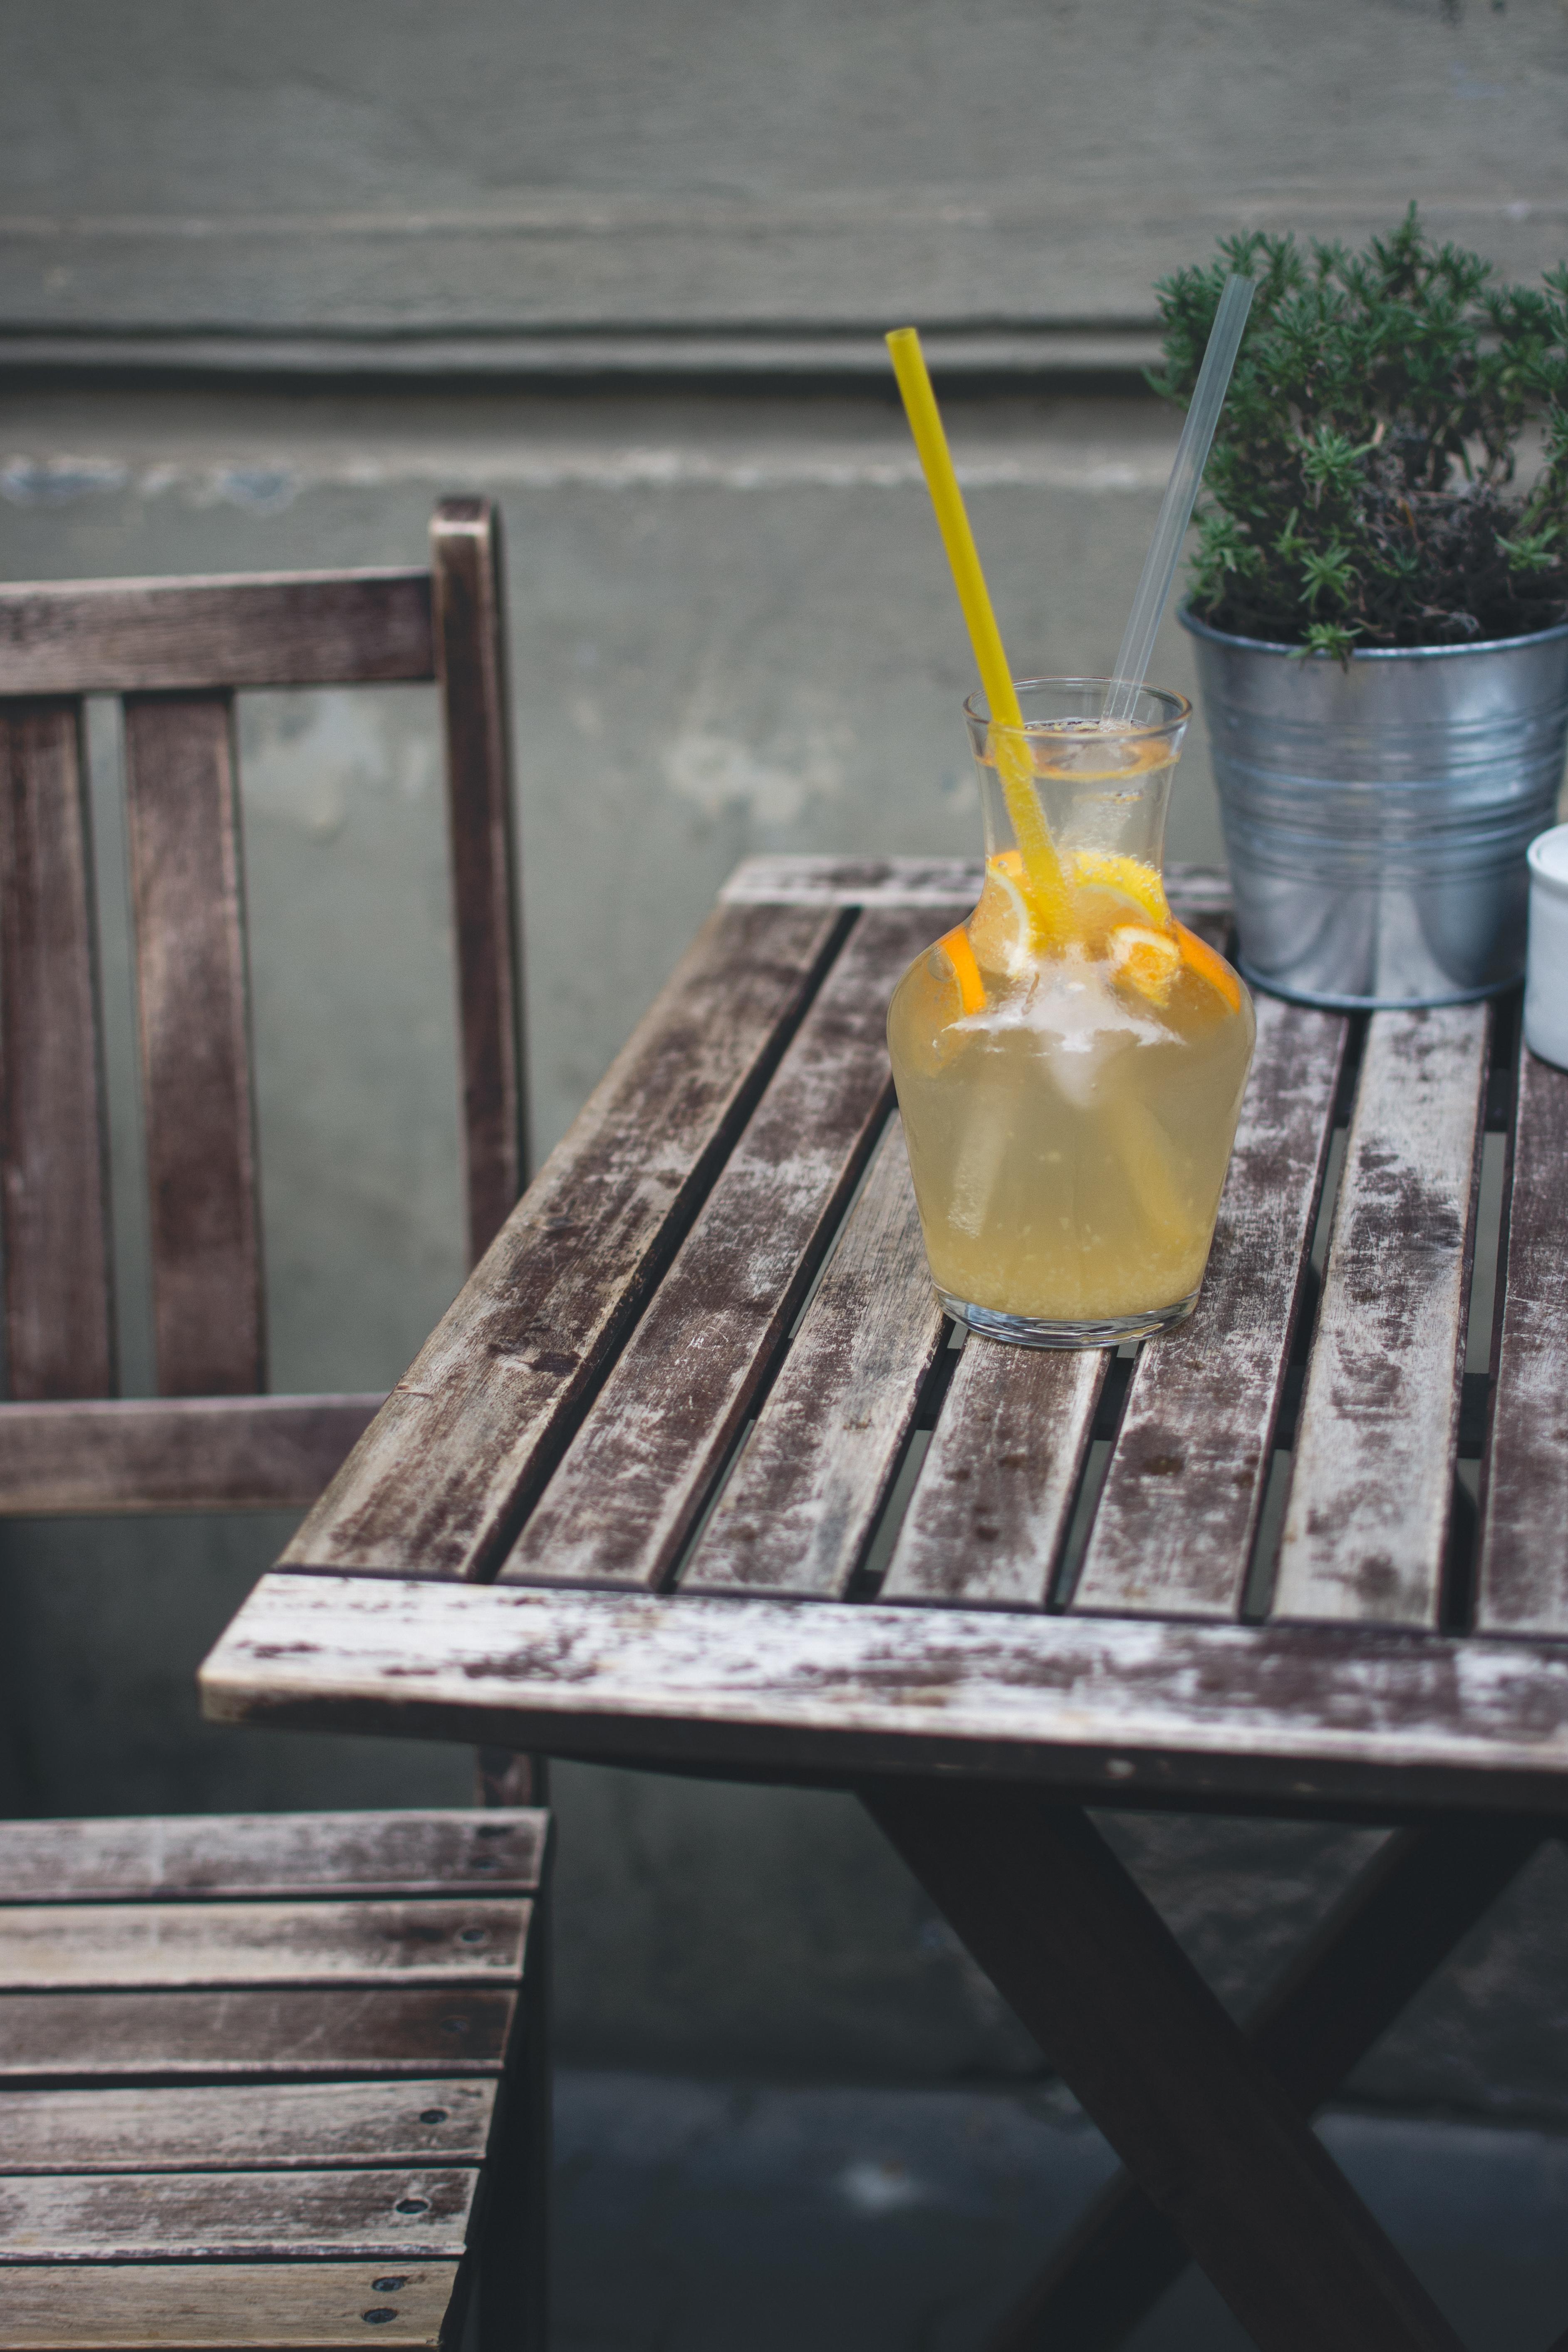 Orange lemonade at a wooden desk outside